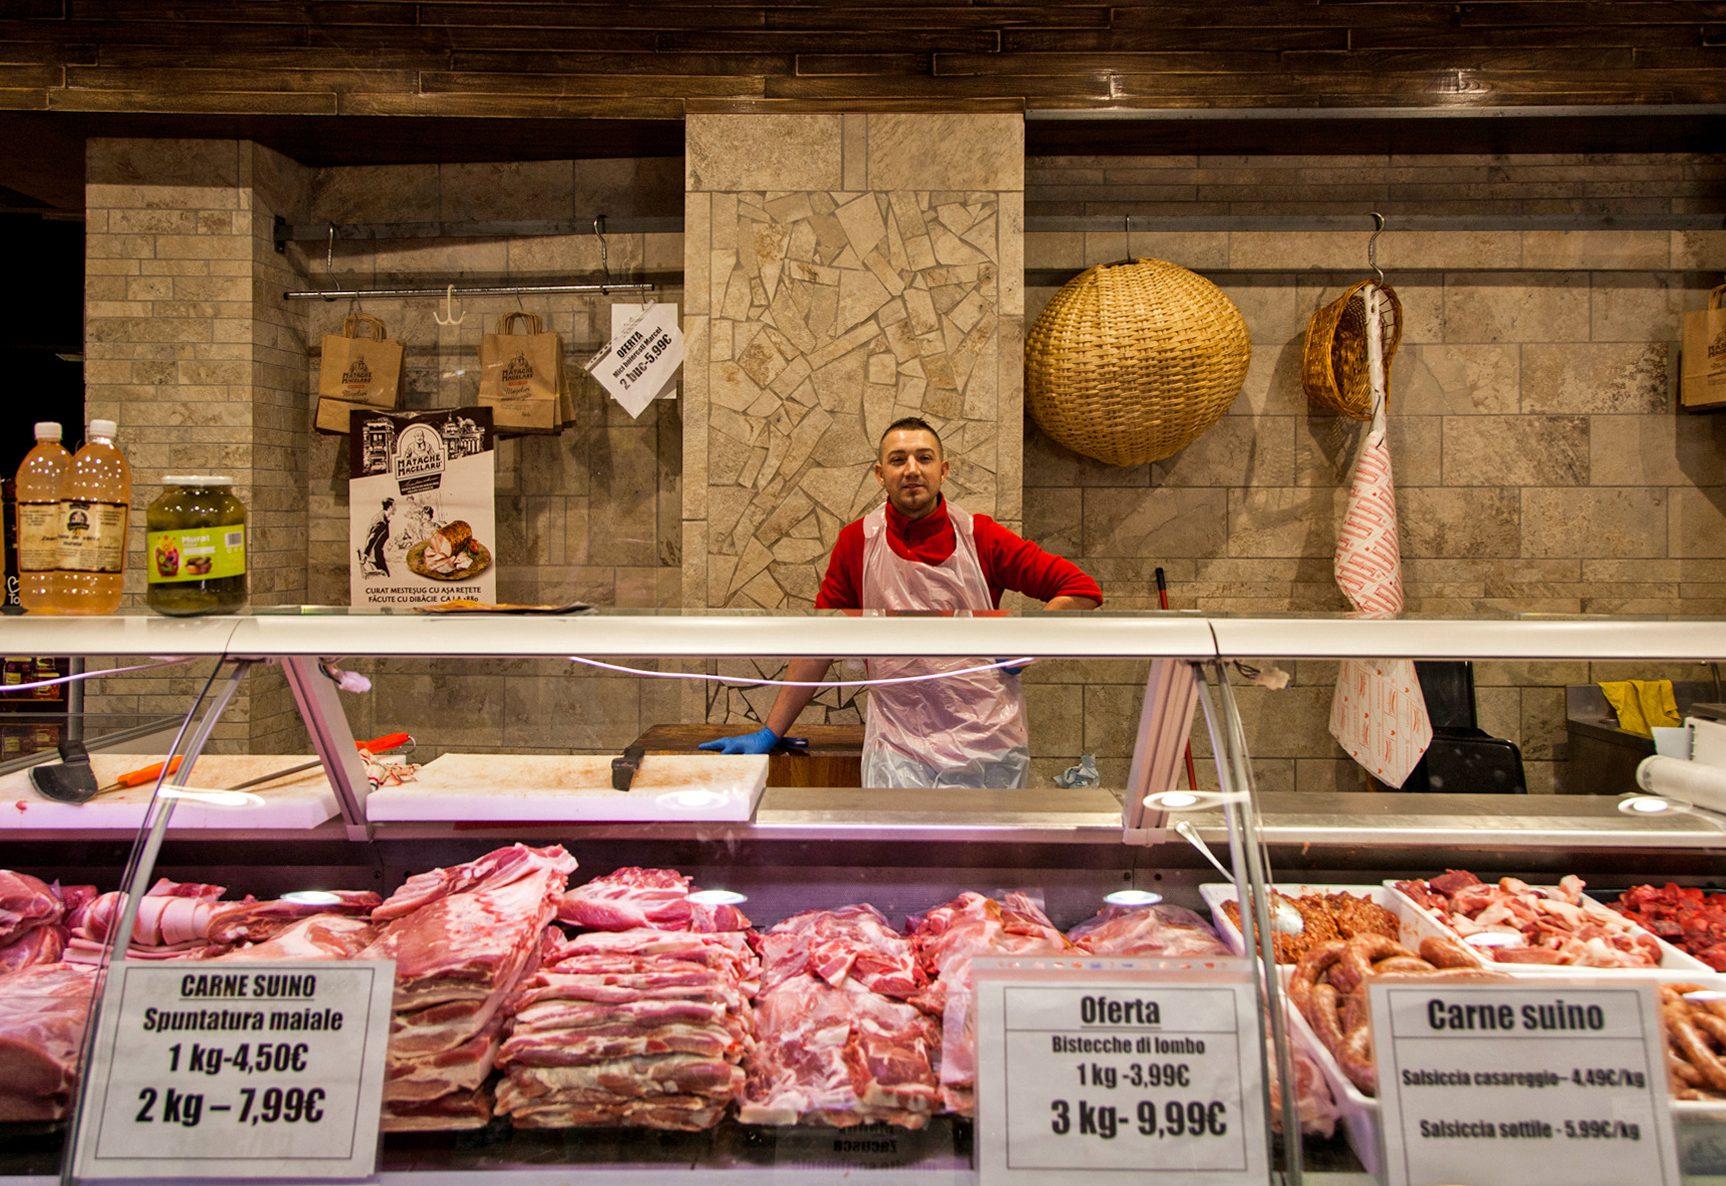 Tiberius Vasile poses for a portrait at the Romanian supermarket La Strada.